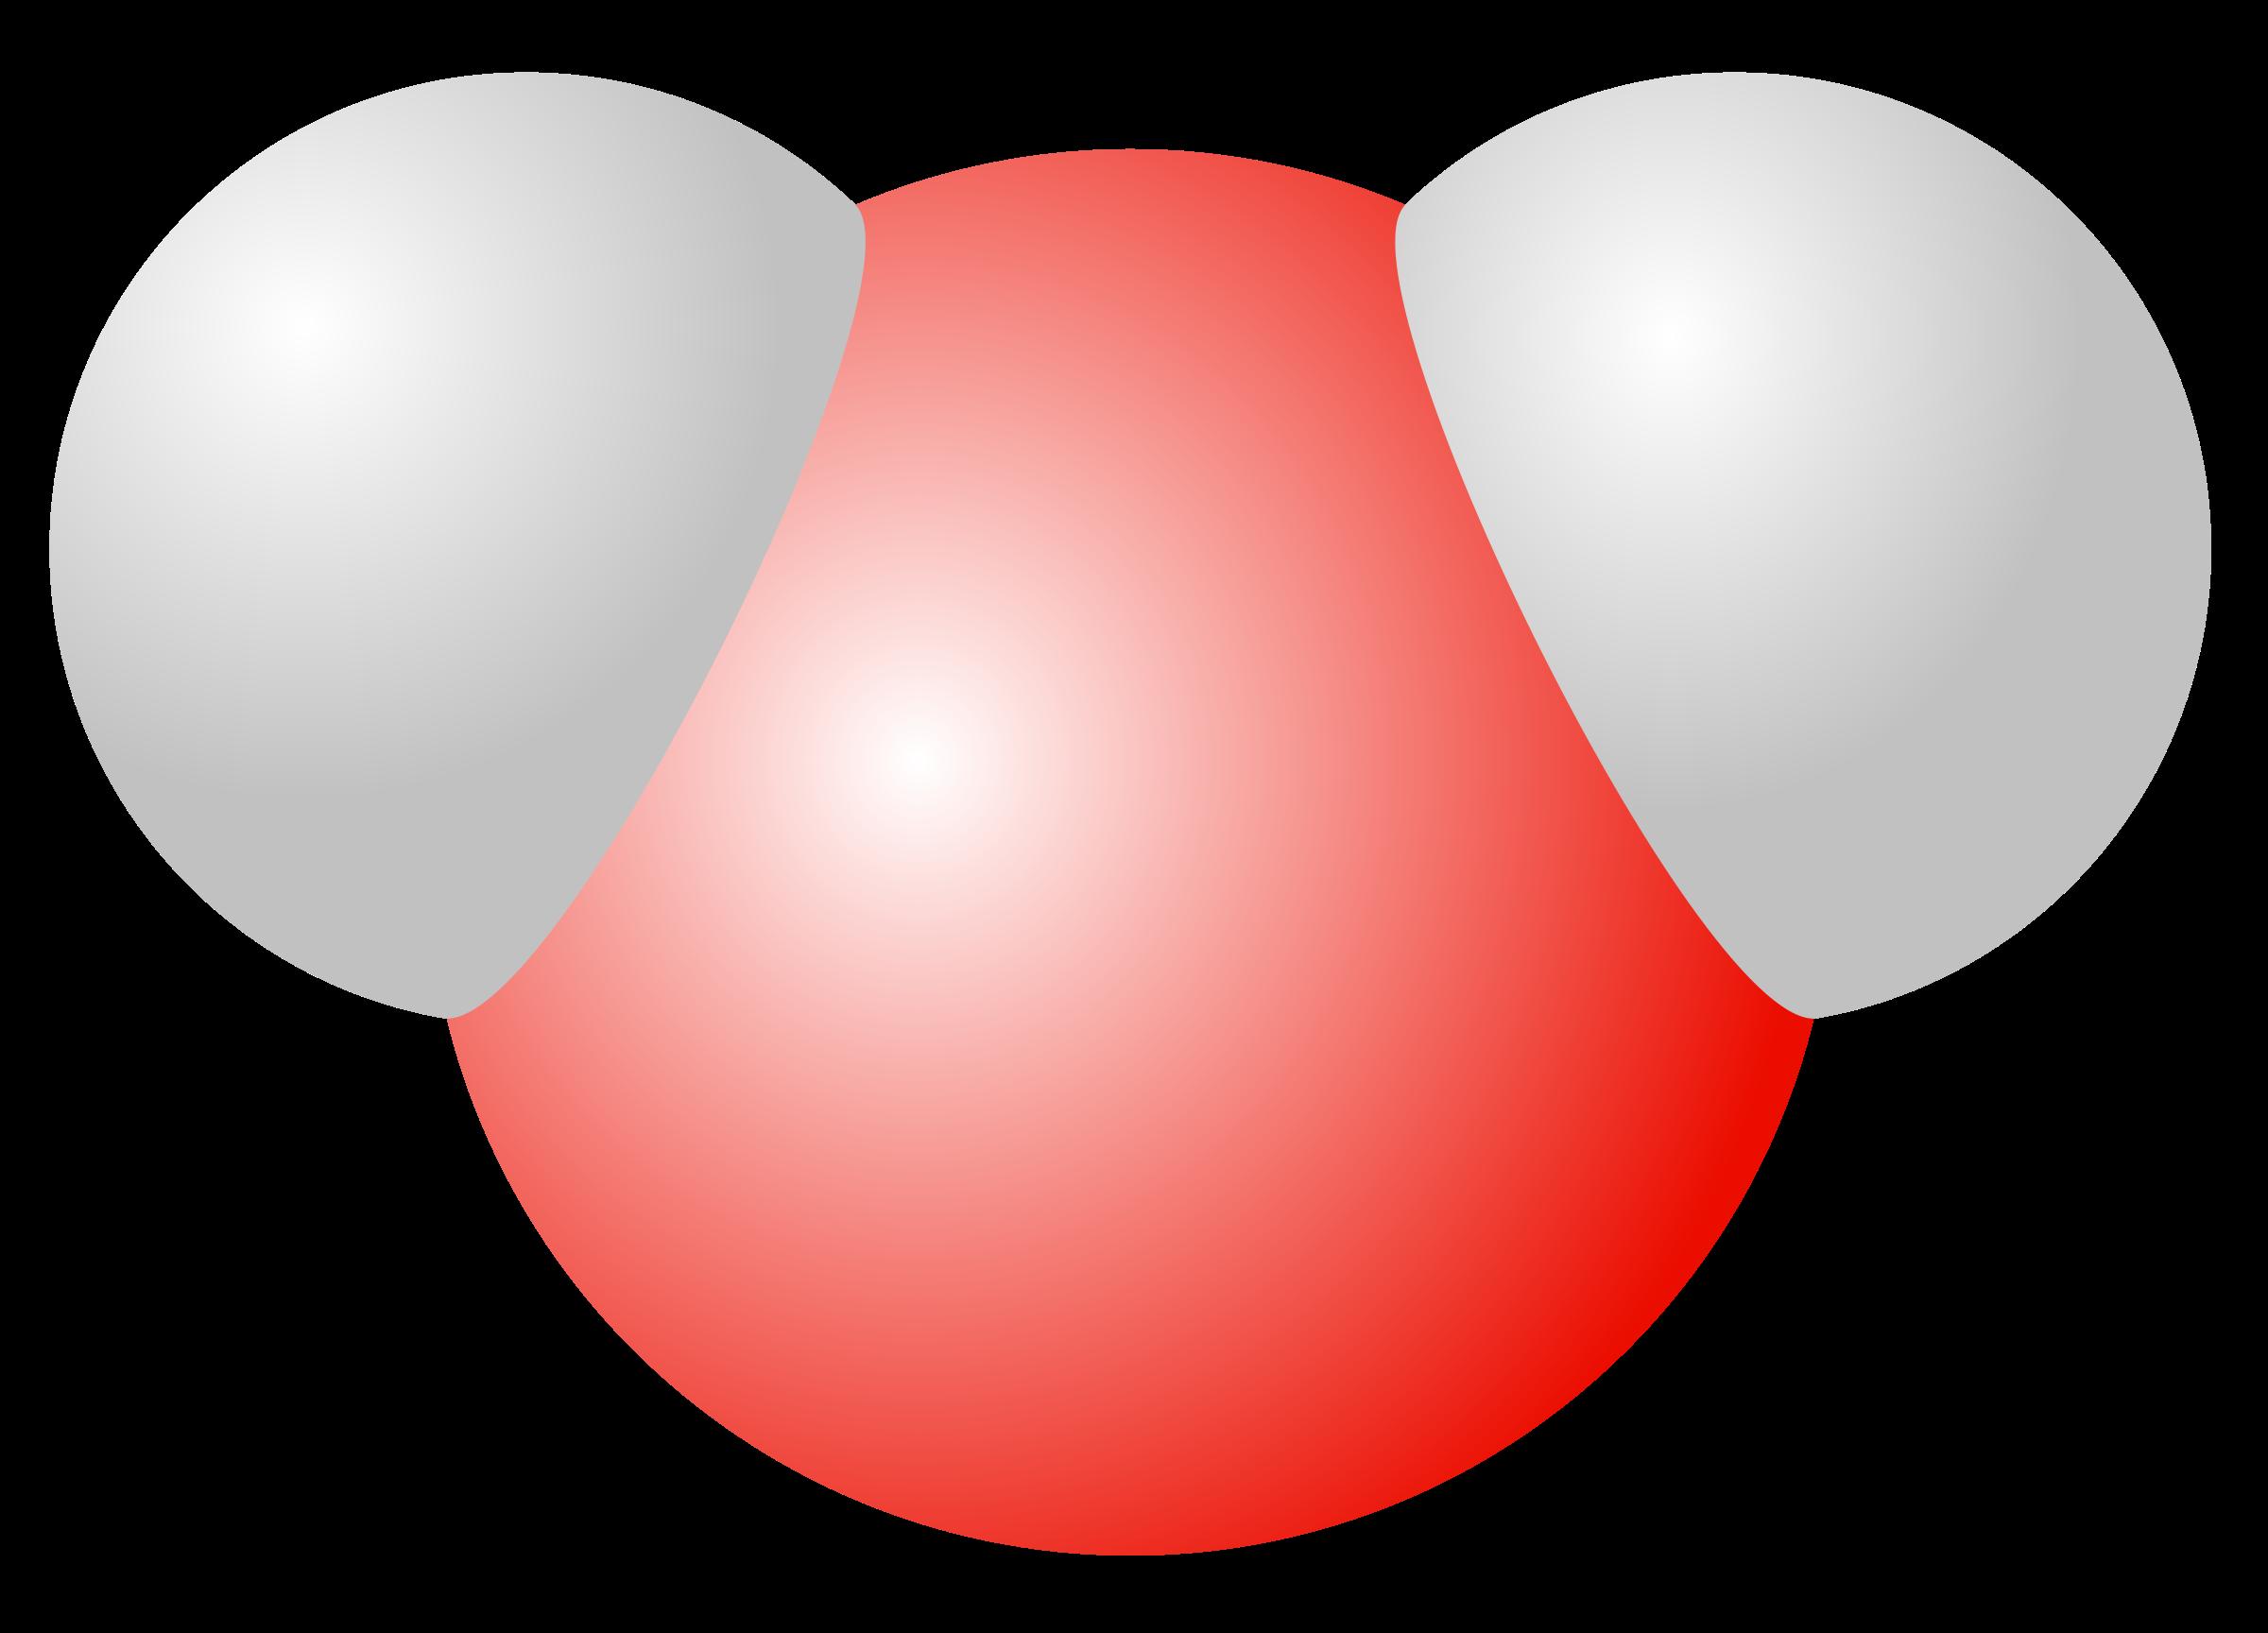 Molecule big image png. Heart clipart water